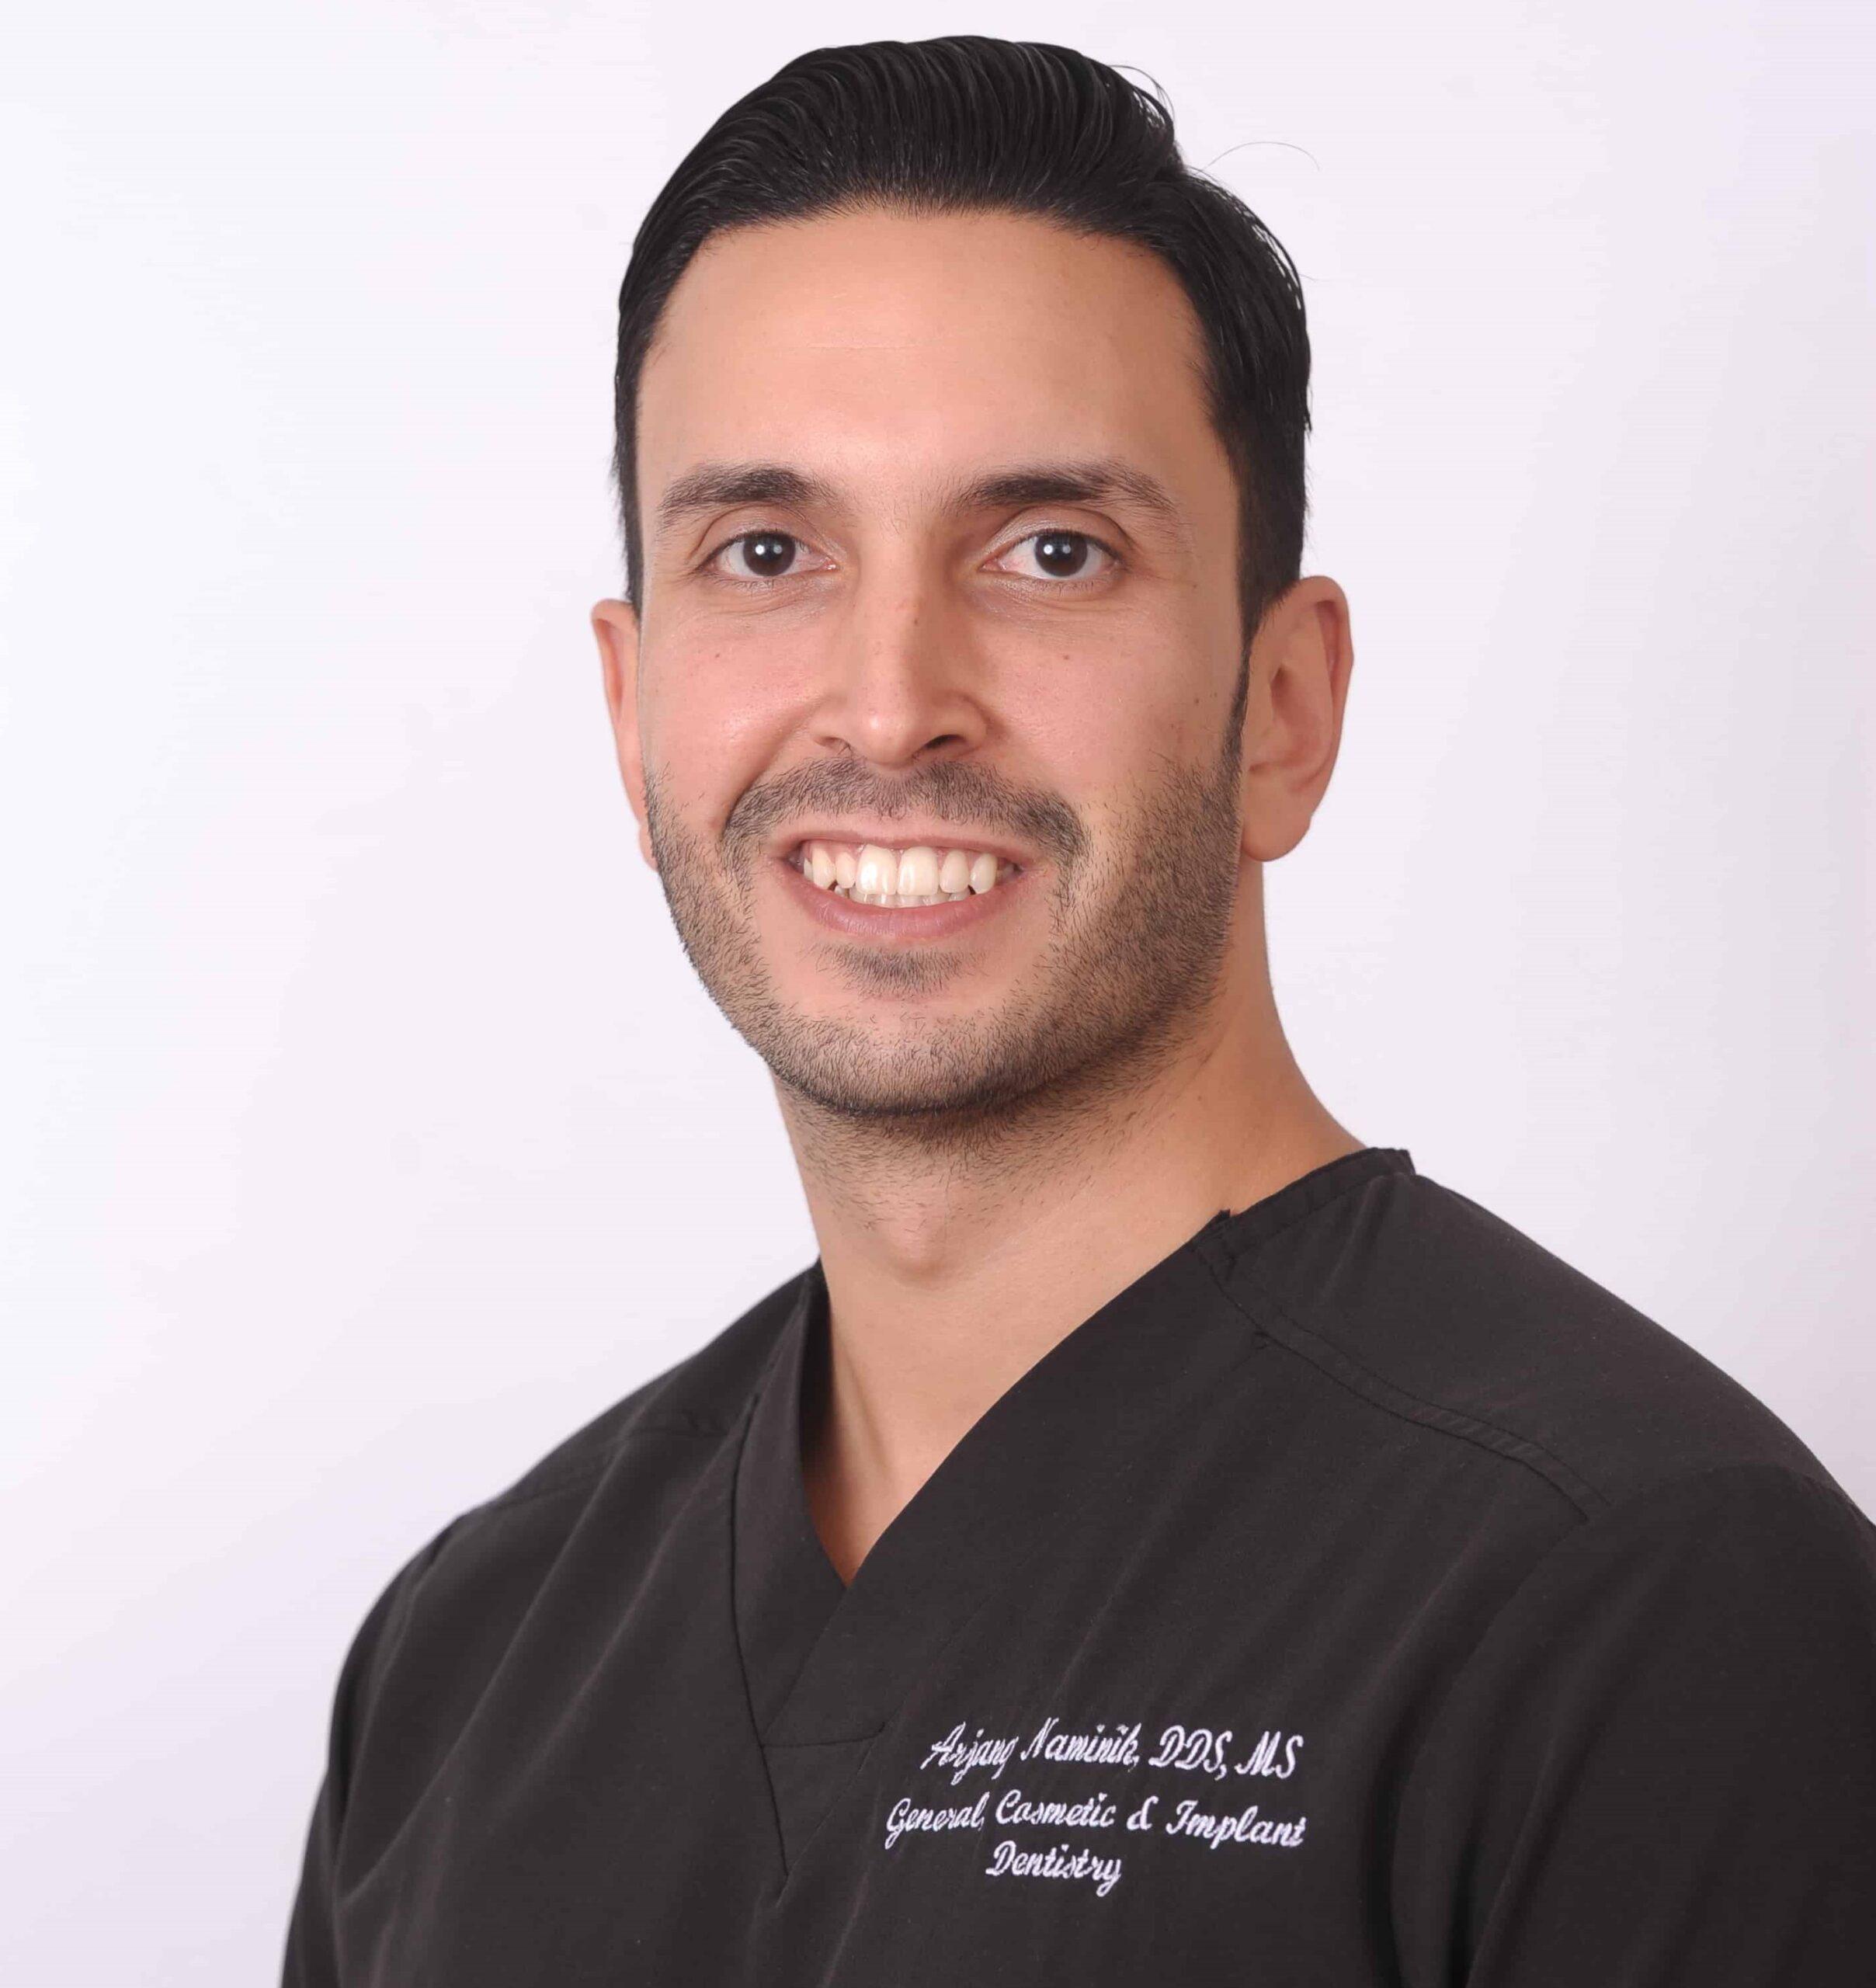 Arjang-Naminik-dentist